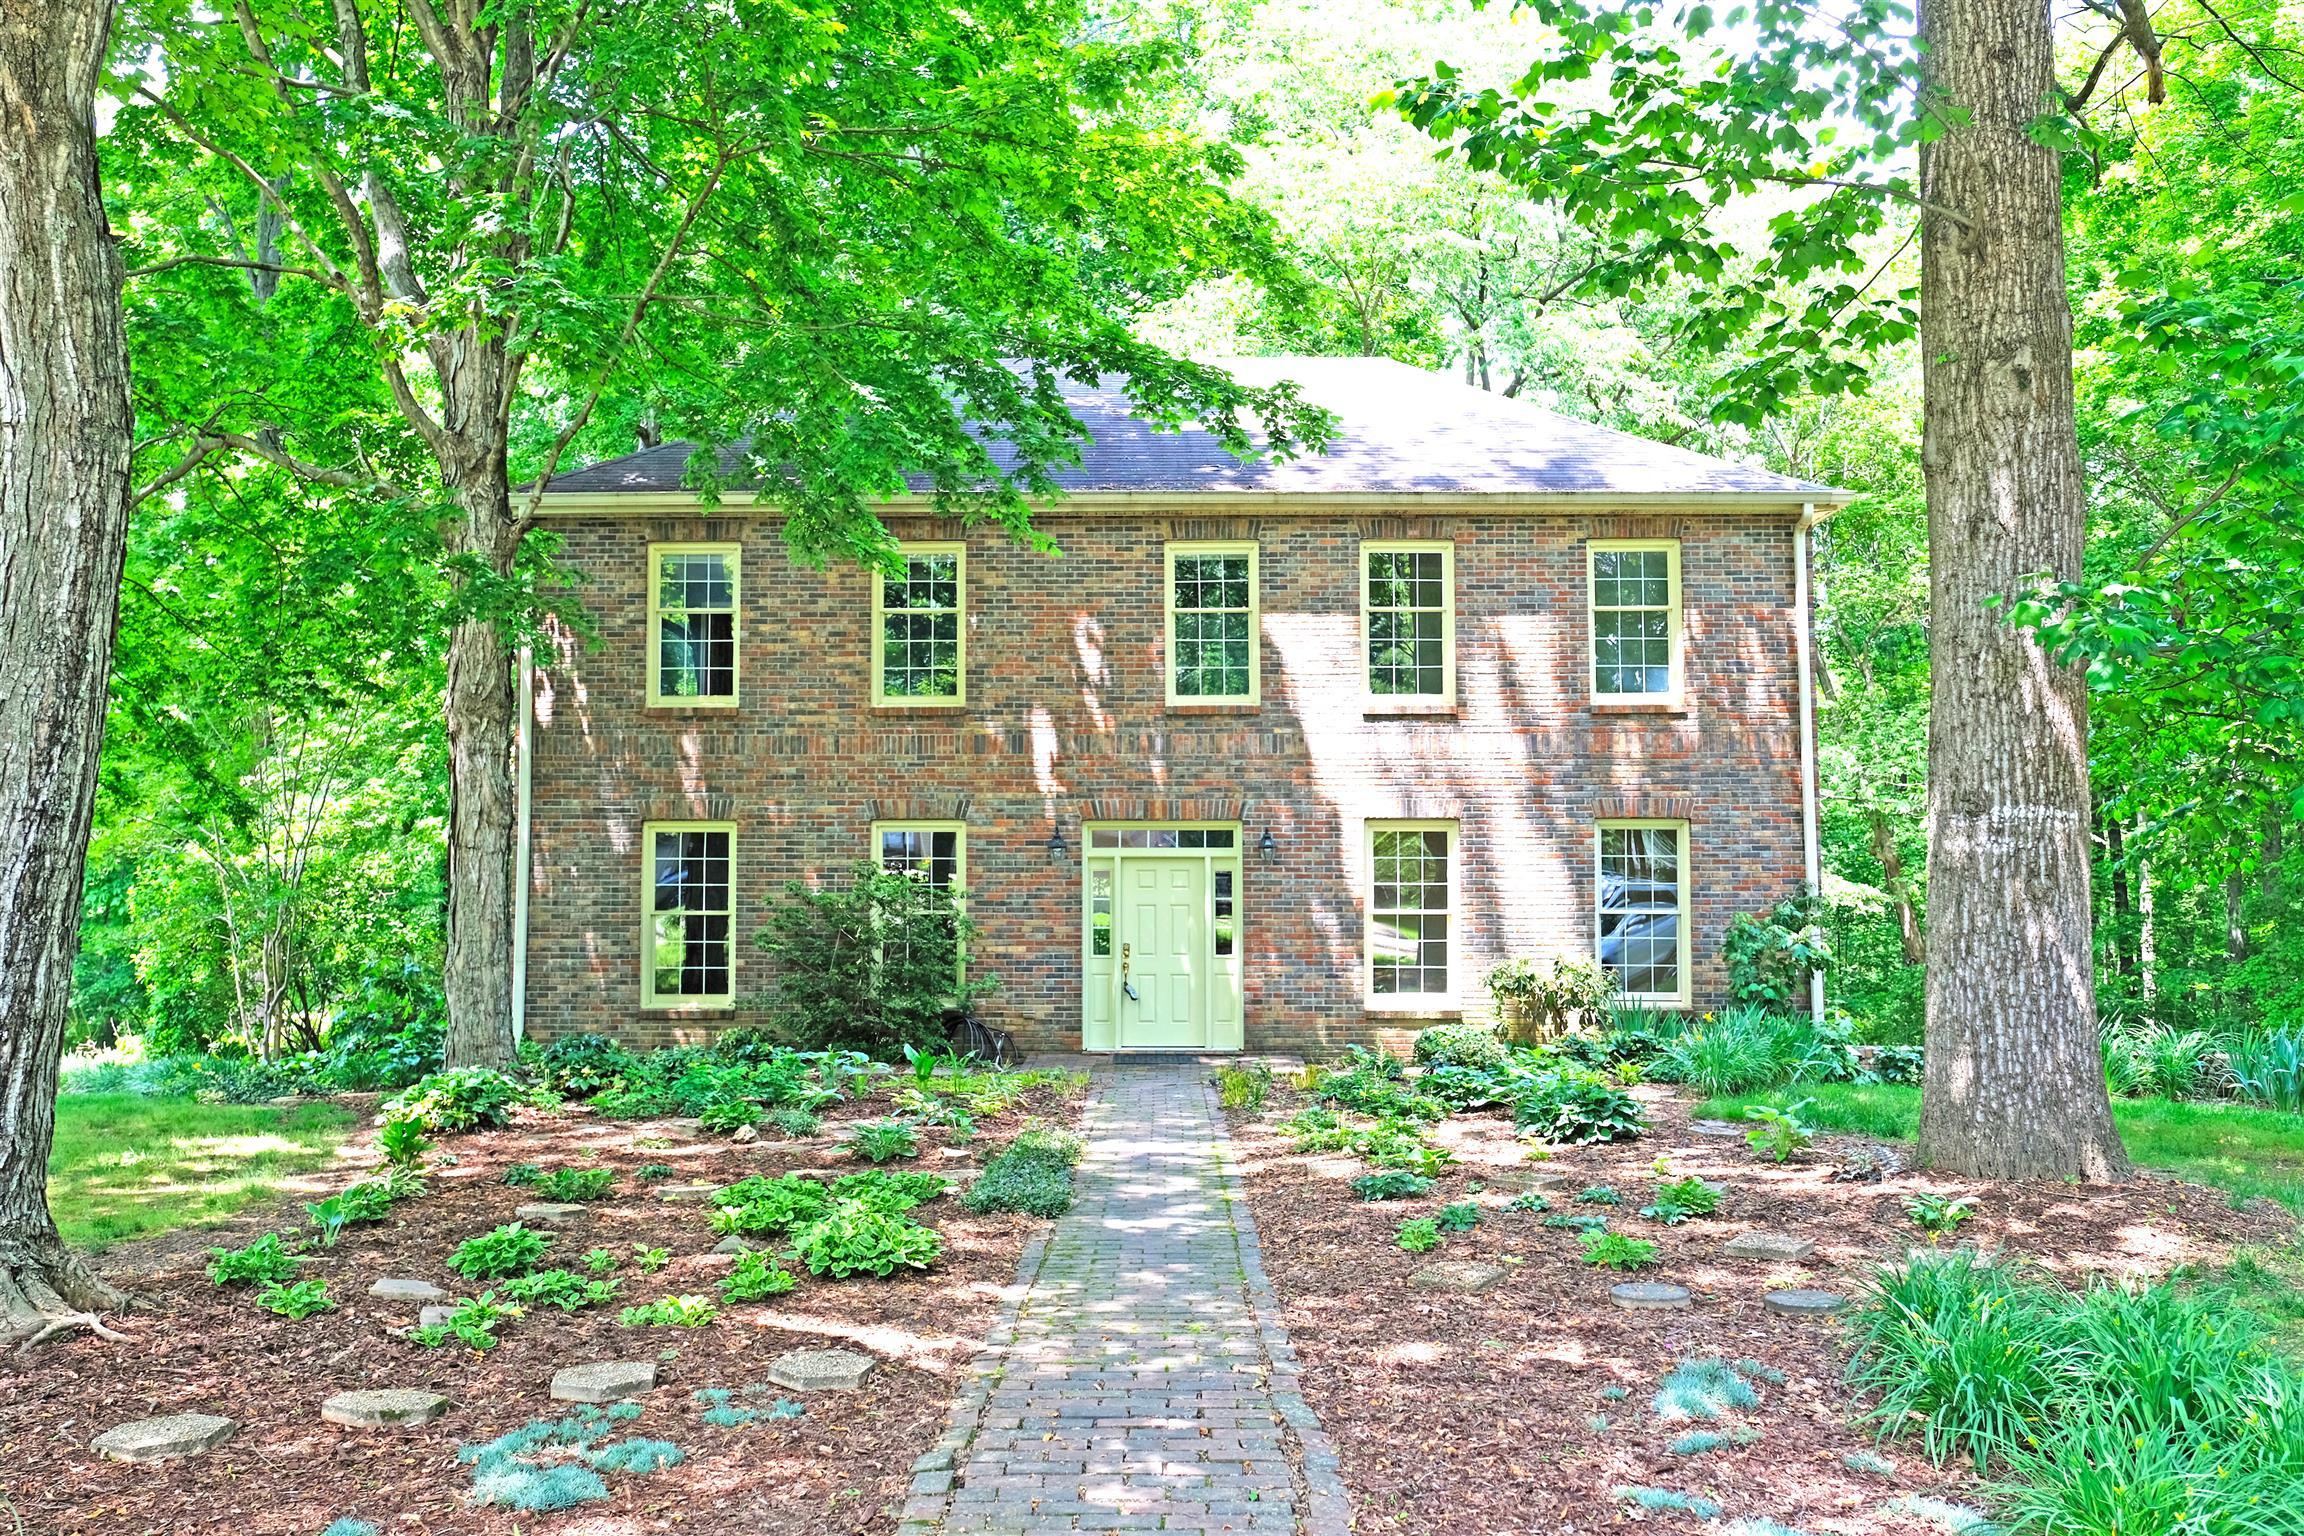 3306 Foxland Ct, Lawrenceburg, TN 38464 - Lawrenceburg, TN real estate listing